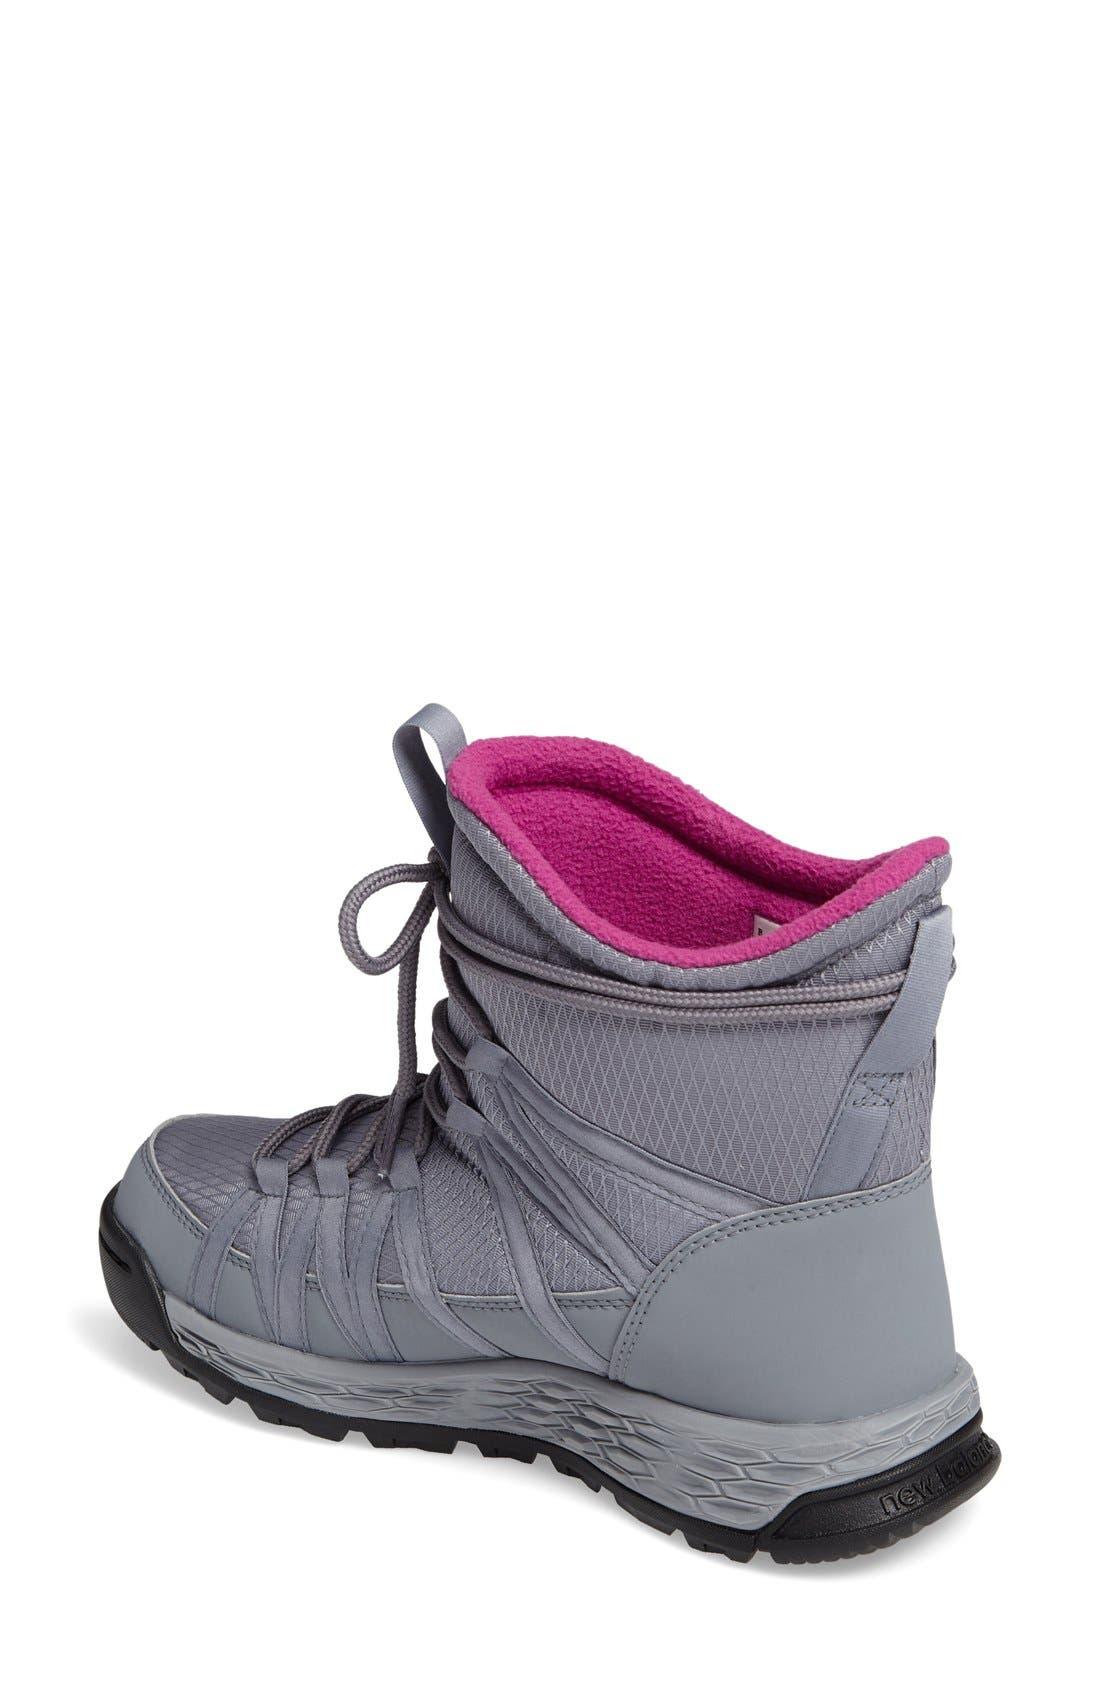 Q416 Weatherproof Snow Boot,                             Alternate thumbnail 14, color,